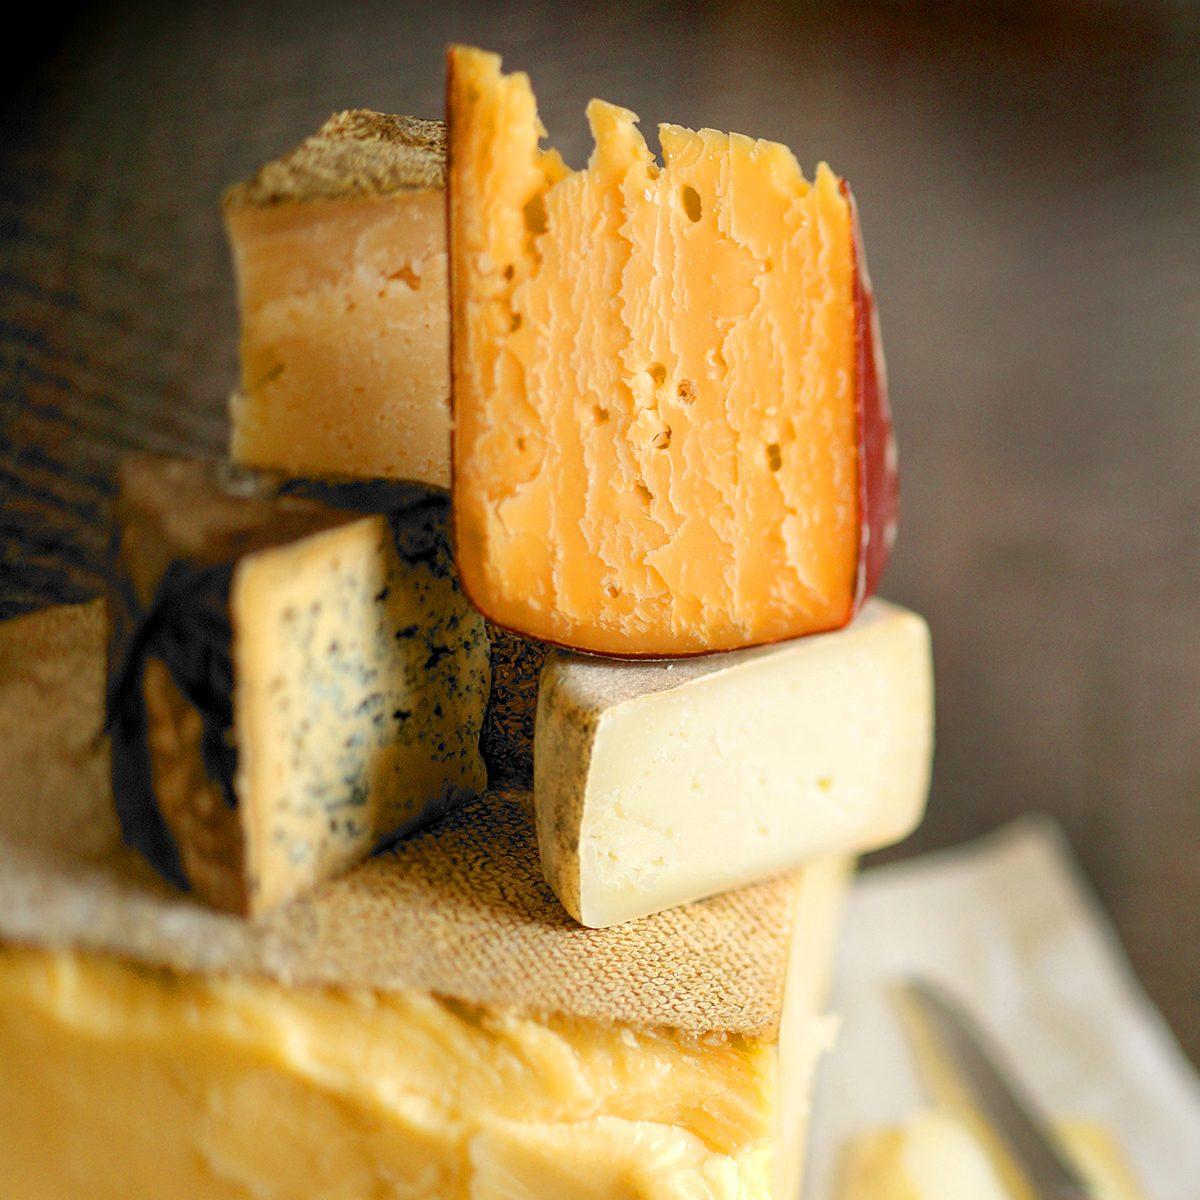 Close up of cheeses